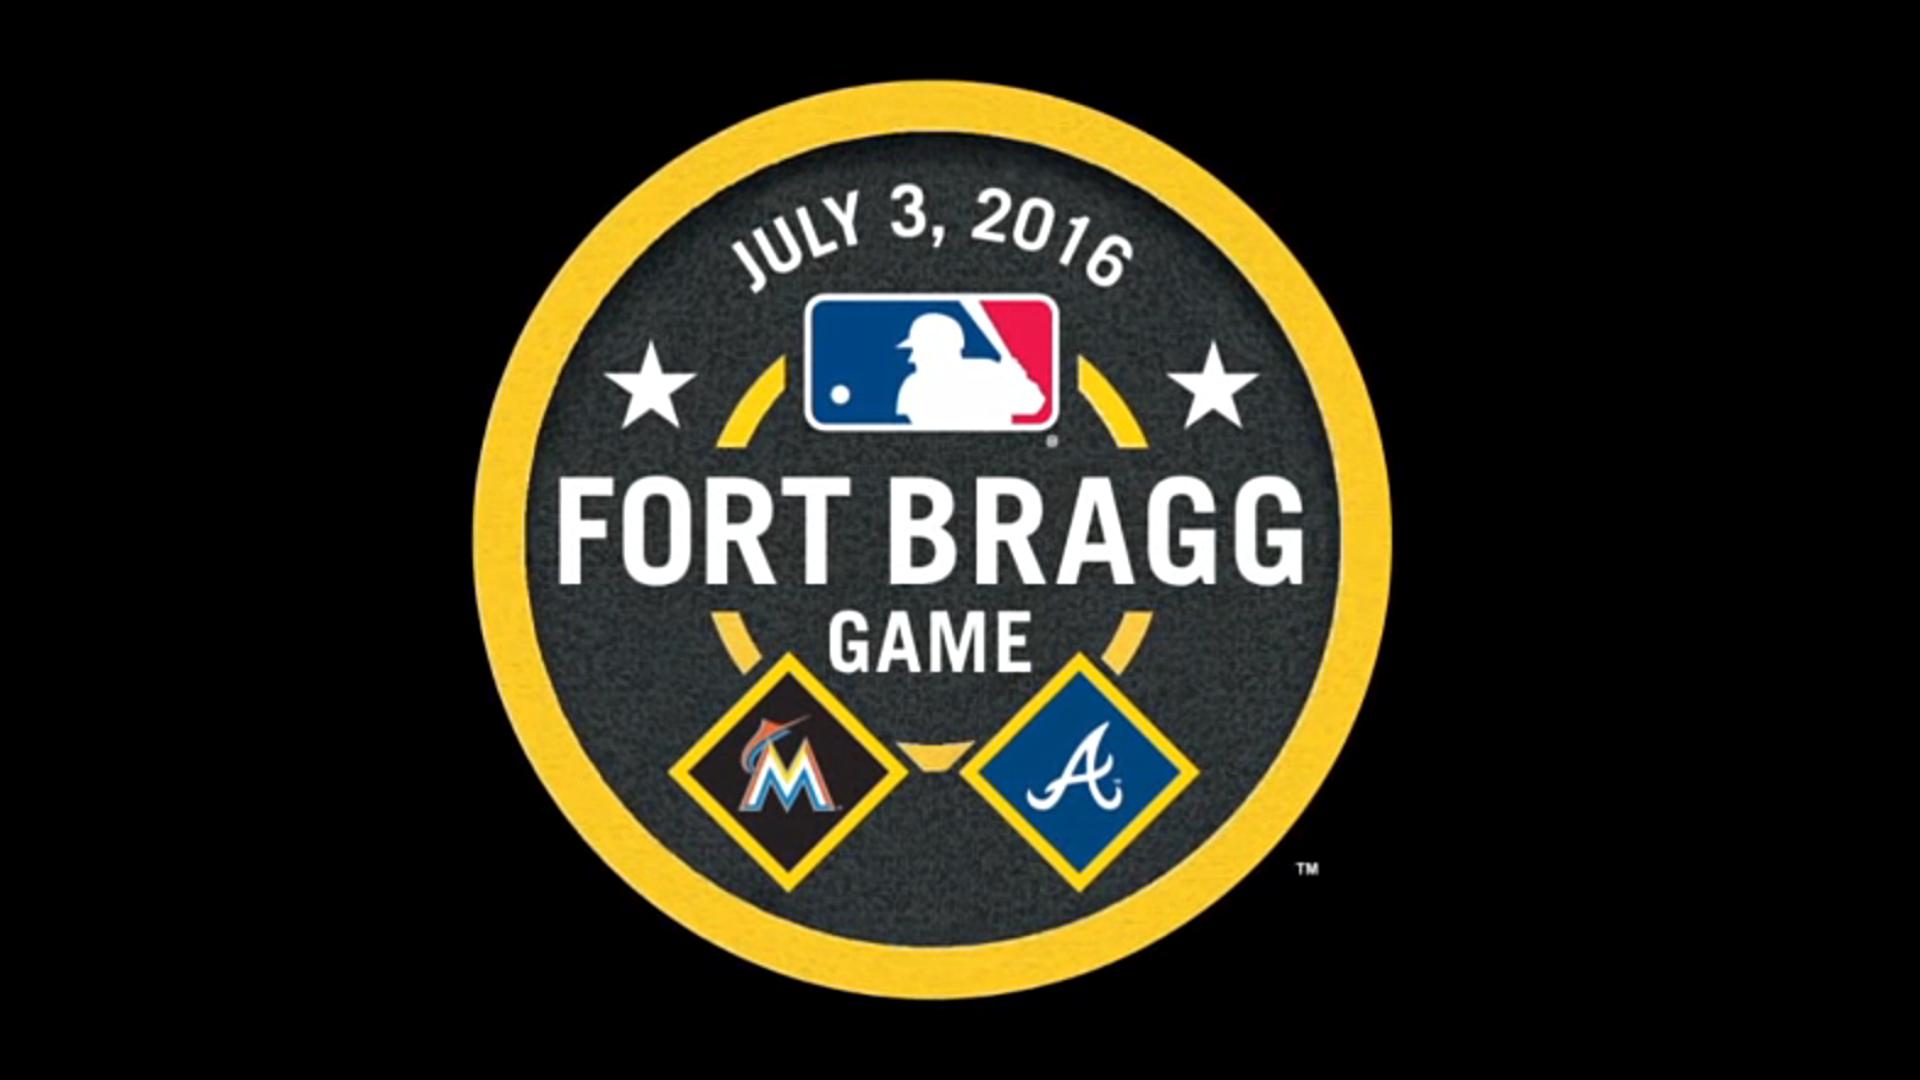 2016 Fort Bragg Game logo